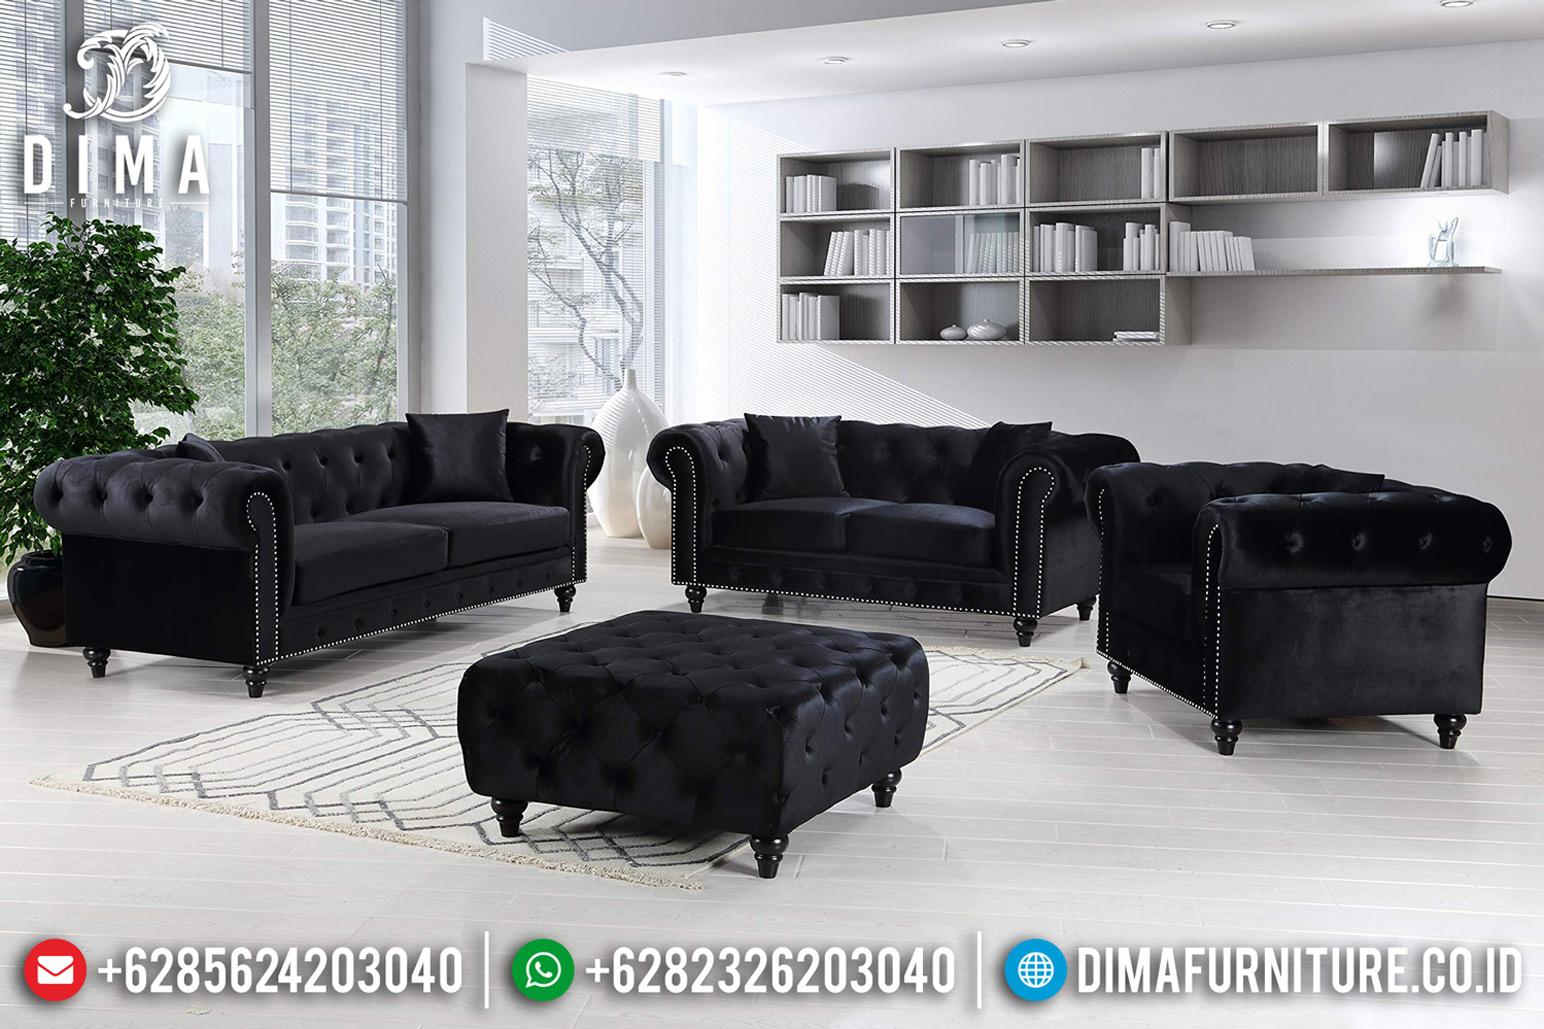 Furniture Jepara Sofa Tamu Minimalis Jepara Natural Jati Type Chesterfield BT-0626